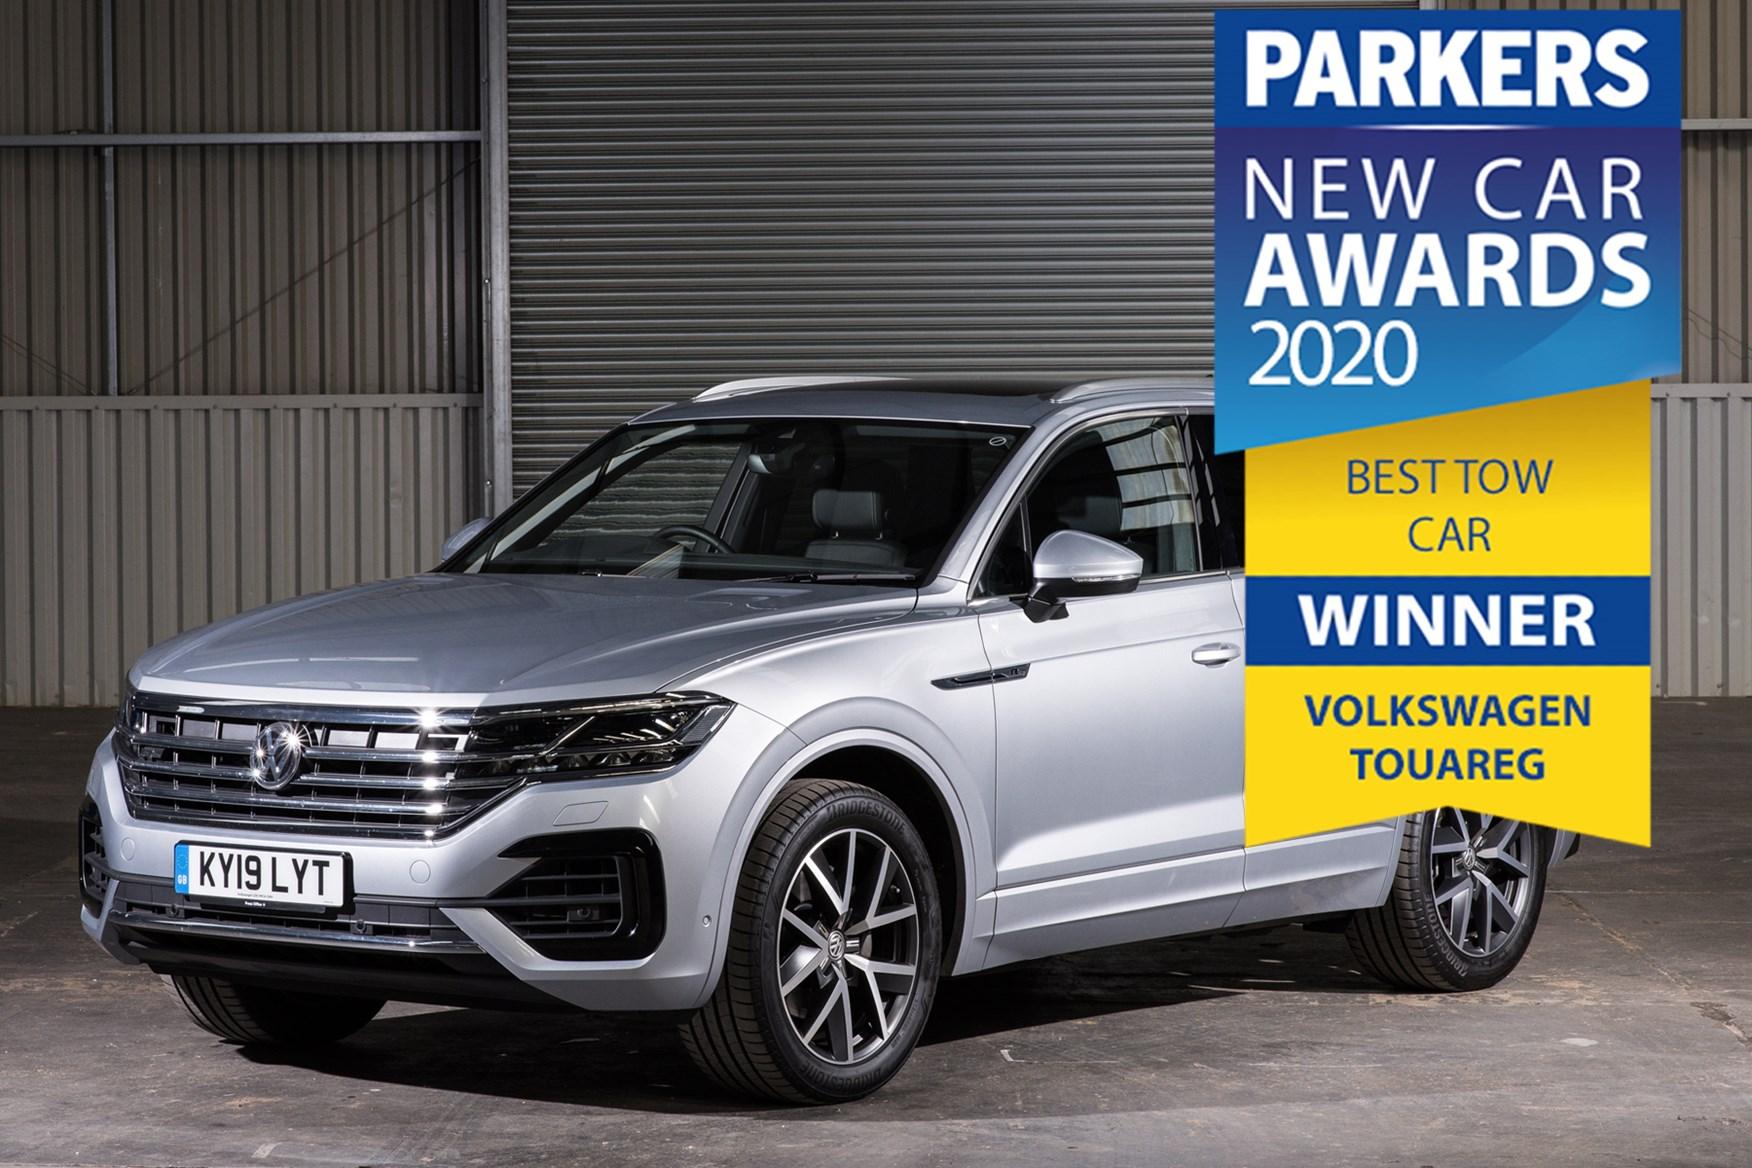 2019 silver Volkswagen Touareg